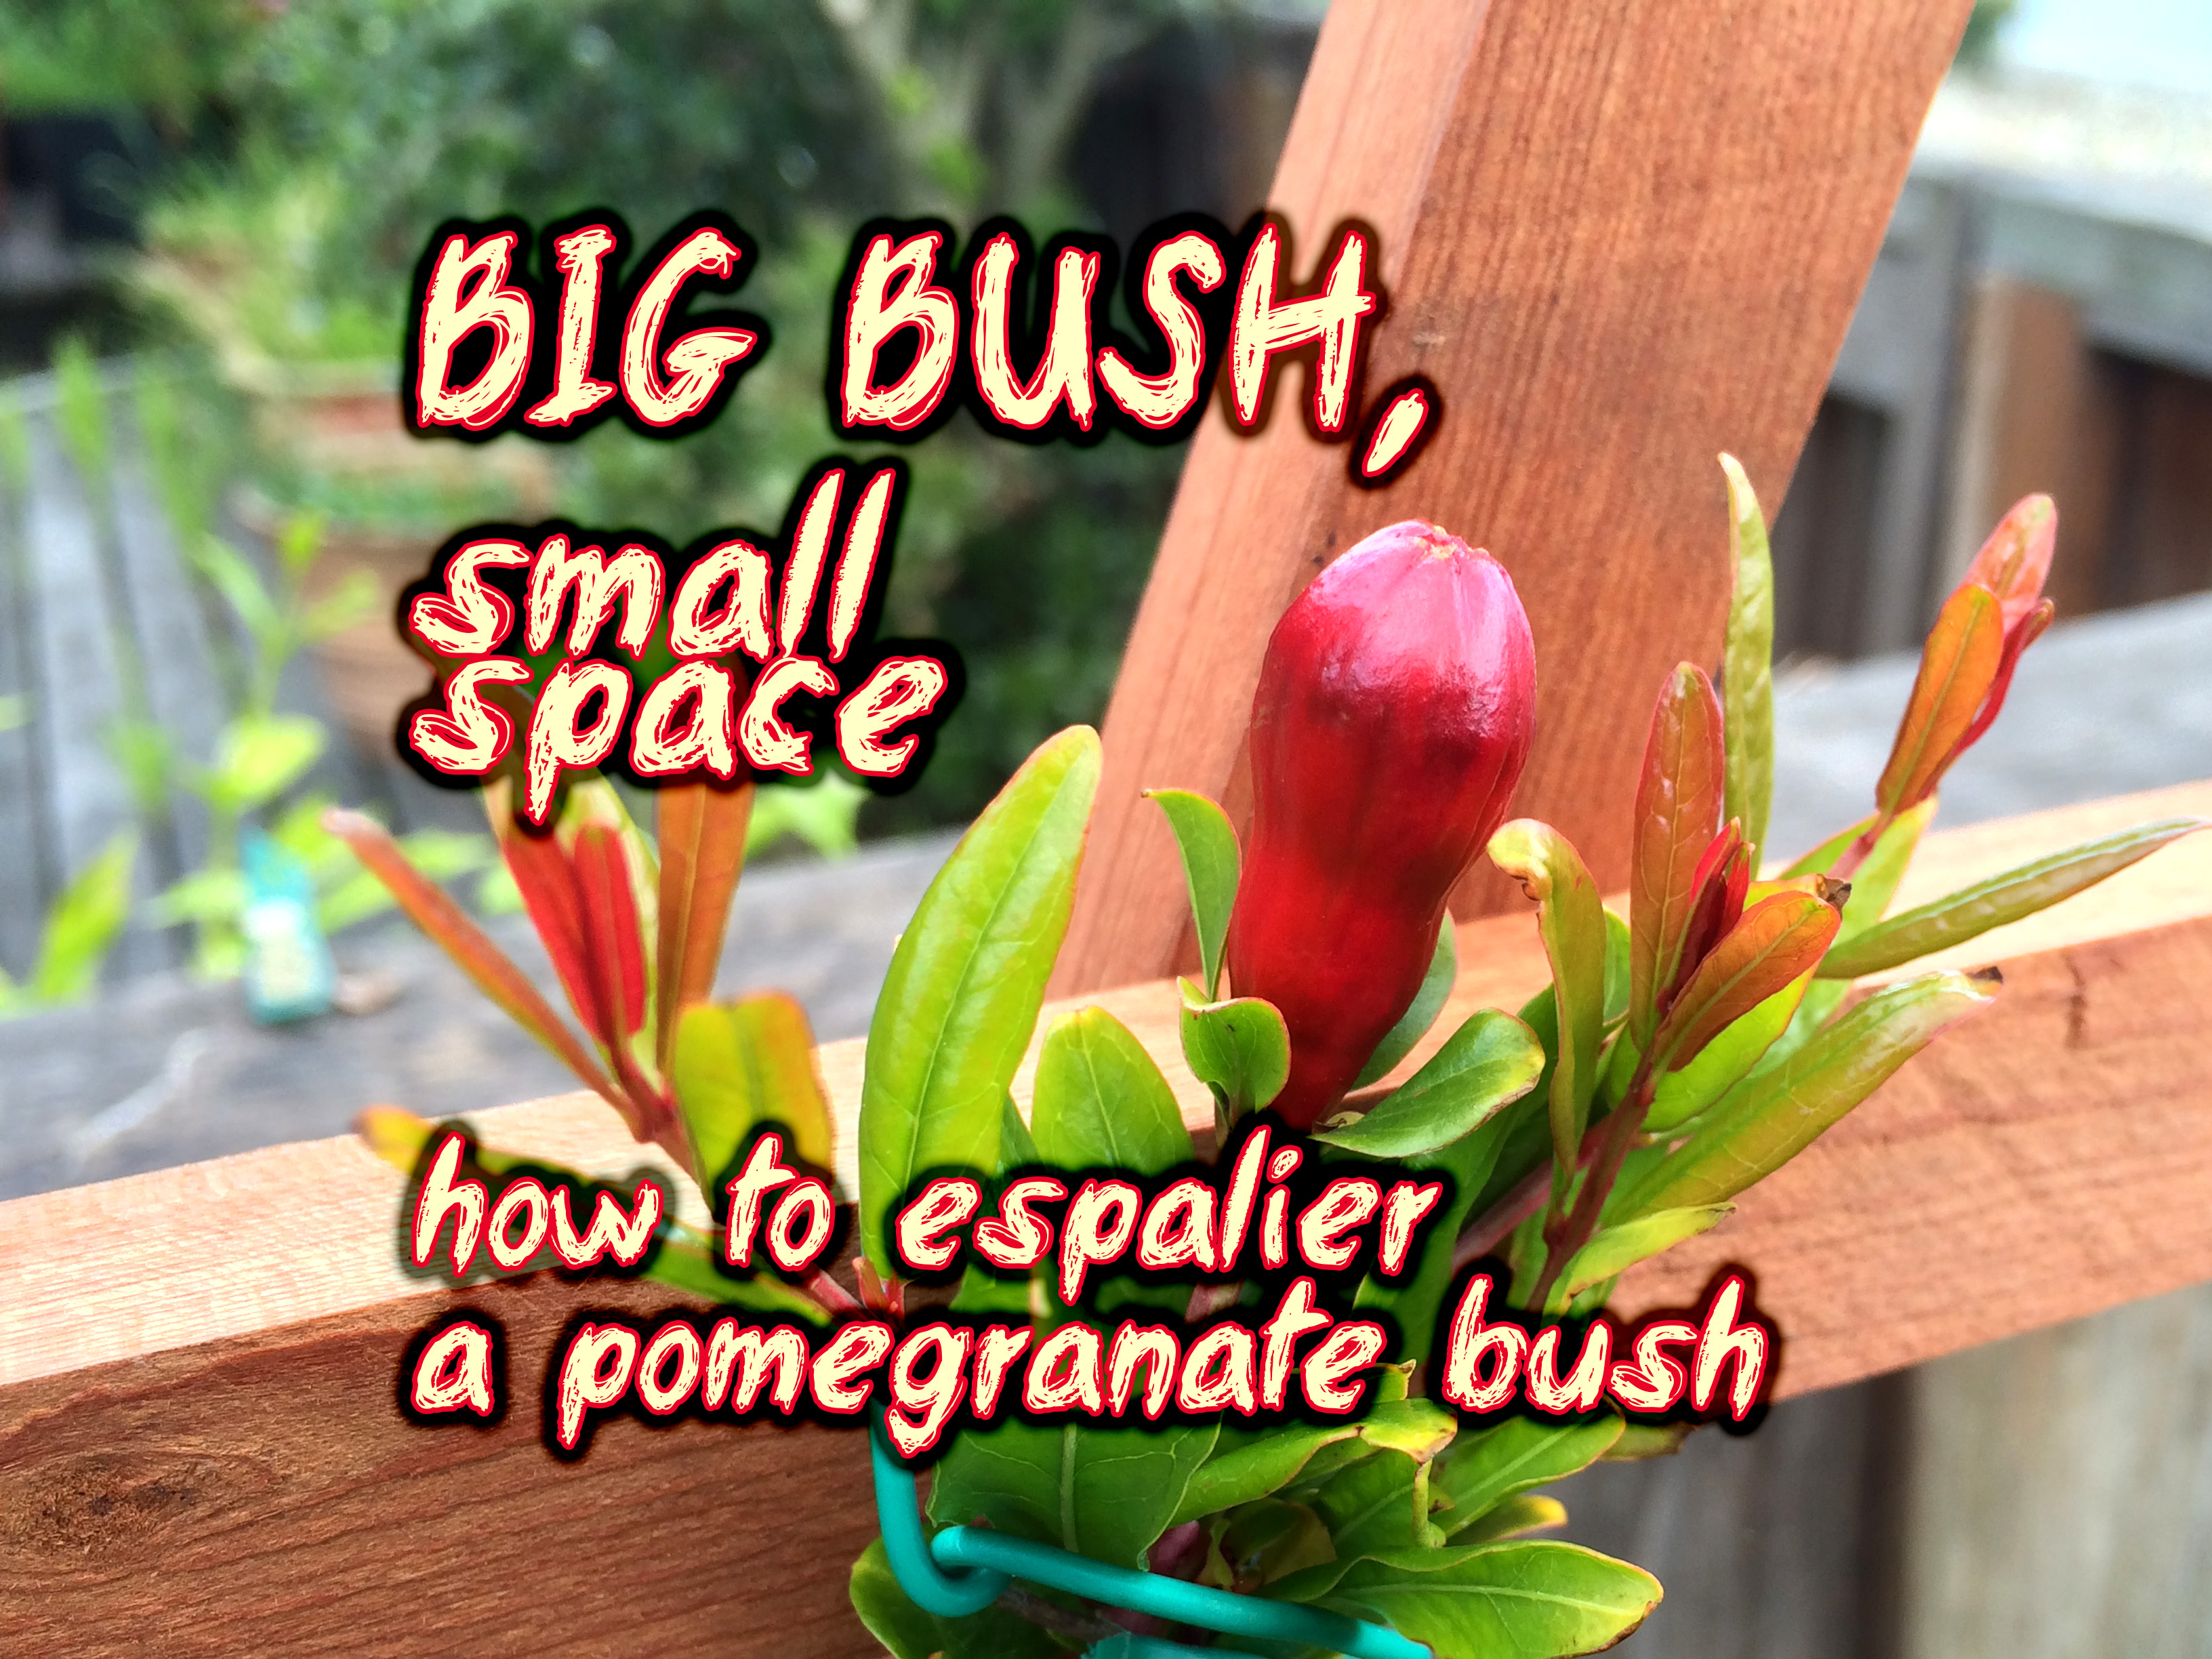 Big Bush, Small Space ~ How to Espalier a Pomegranate Bush